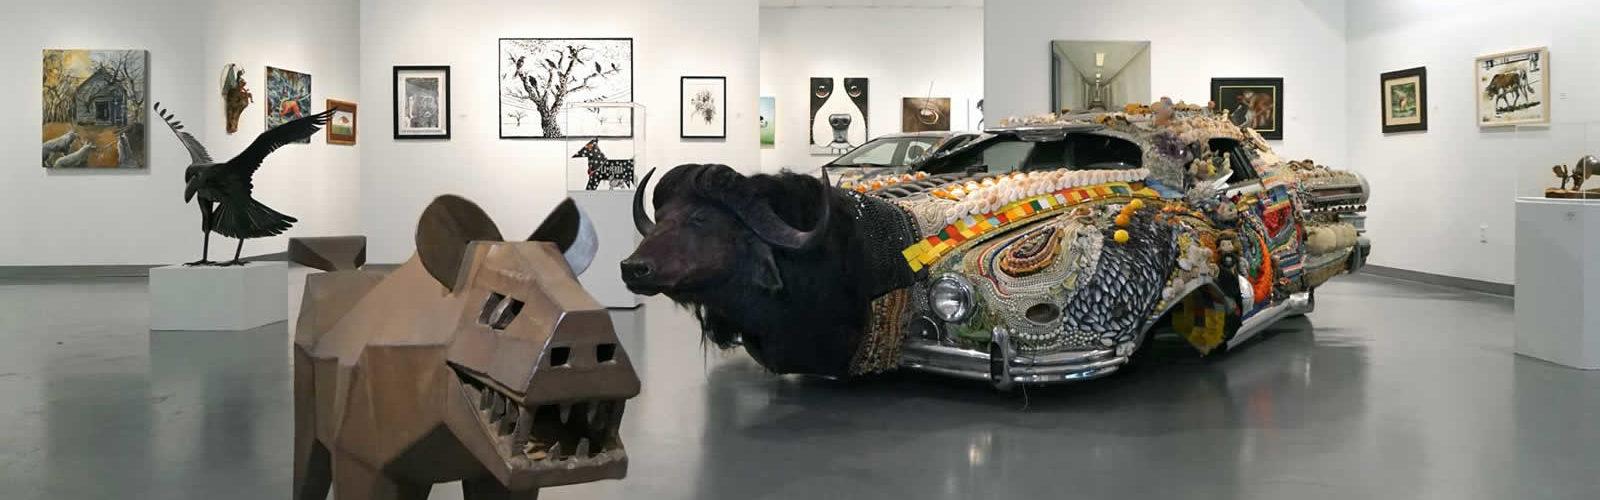 art-car-museum-houston-art-automobile-musee-une